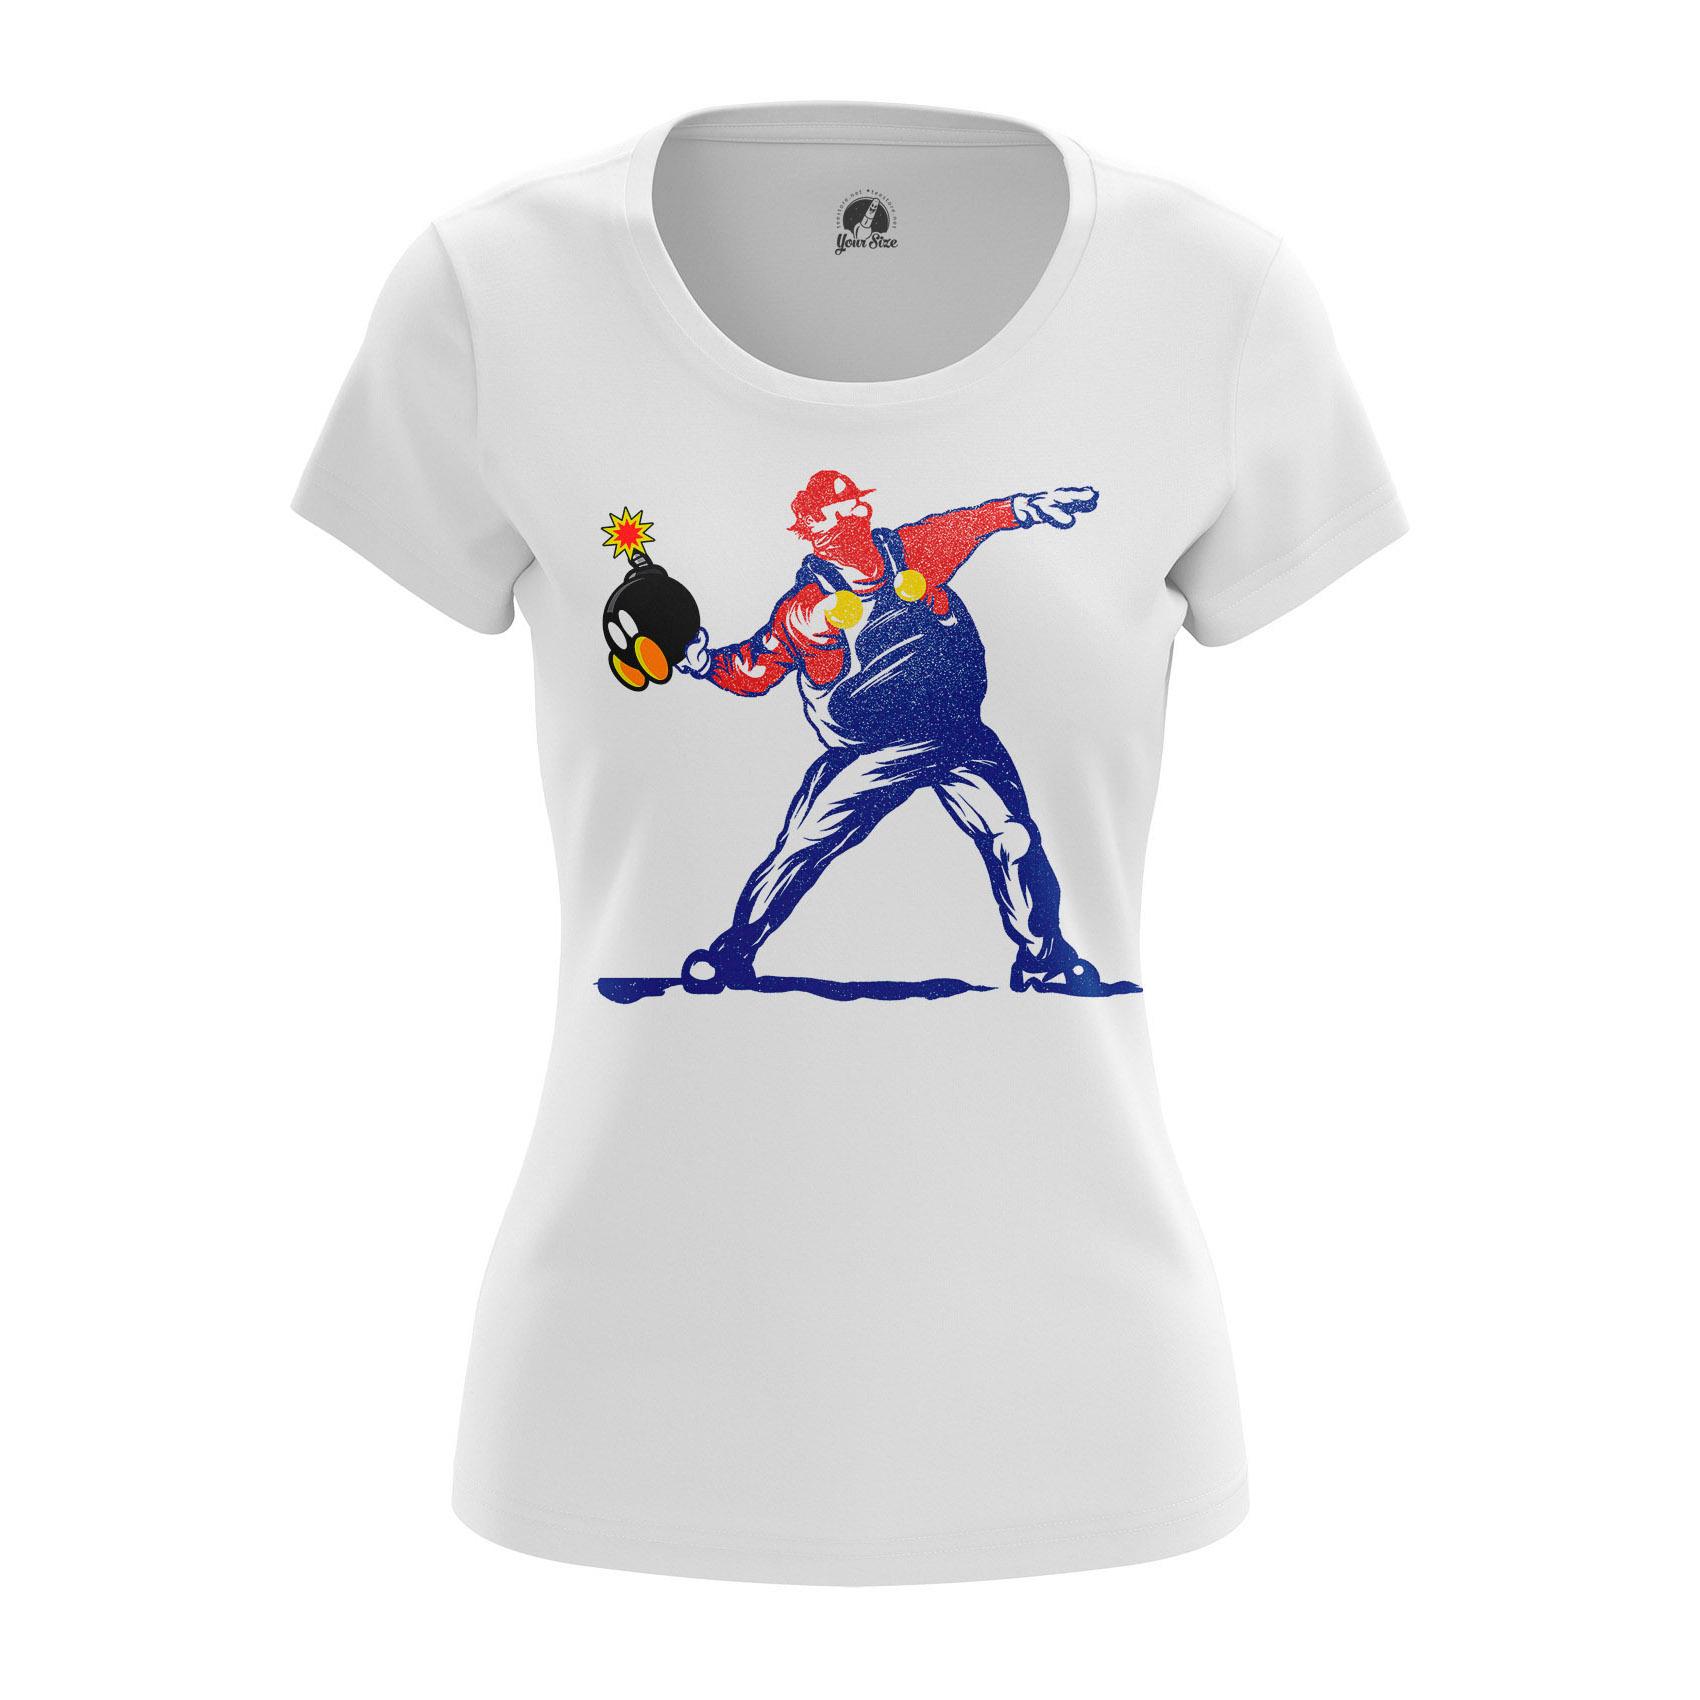 - W Tee Bomberman 1482275263 96